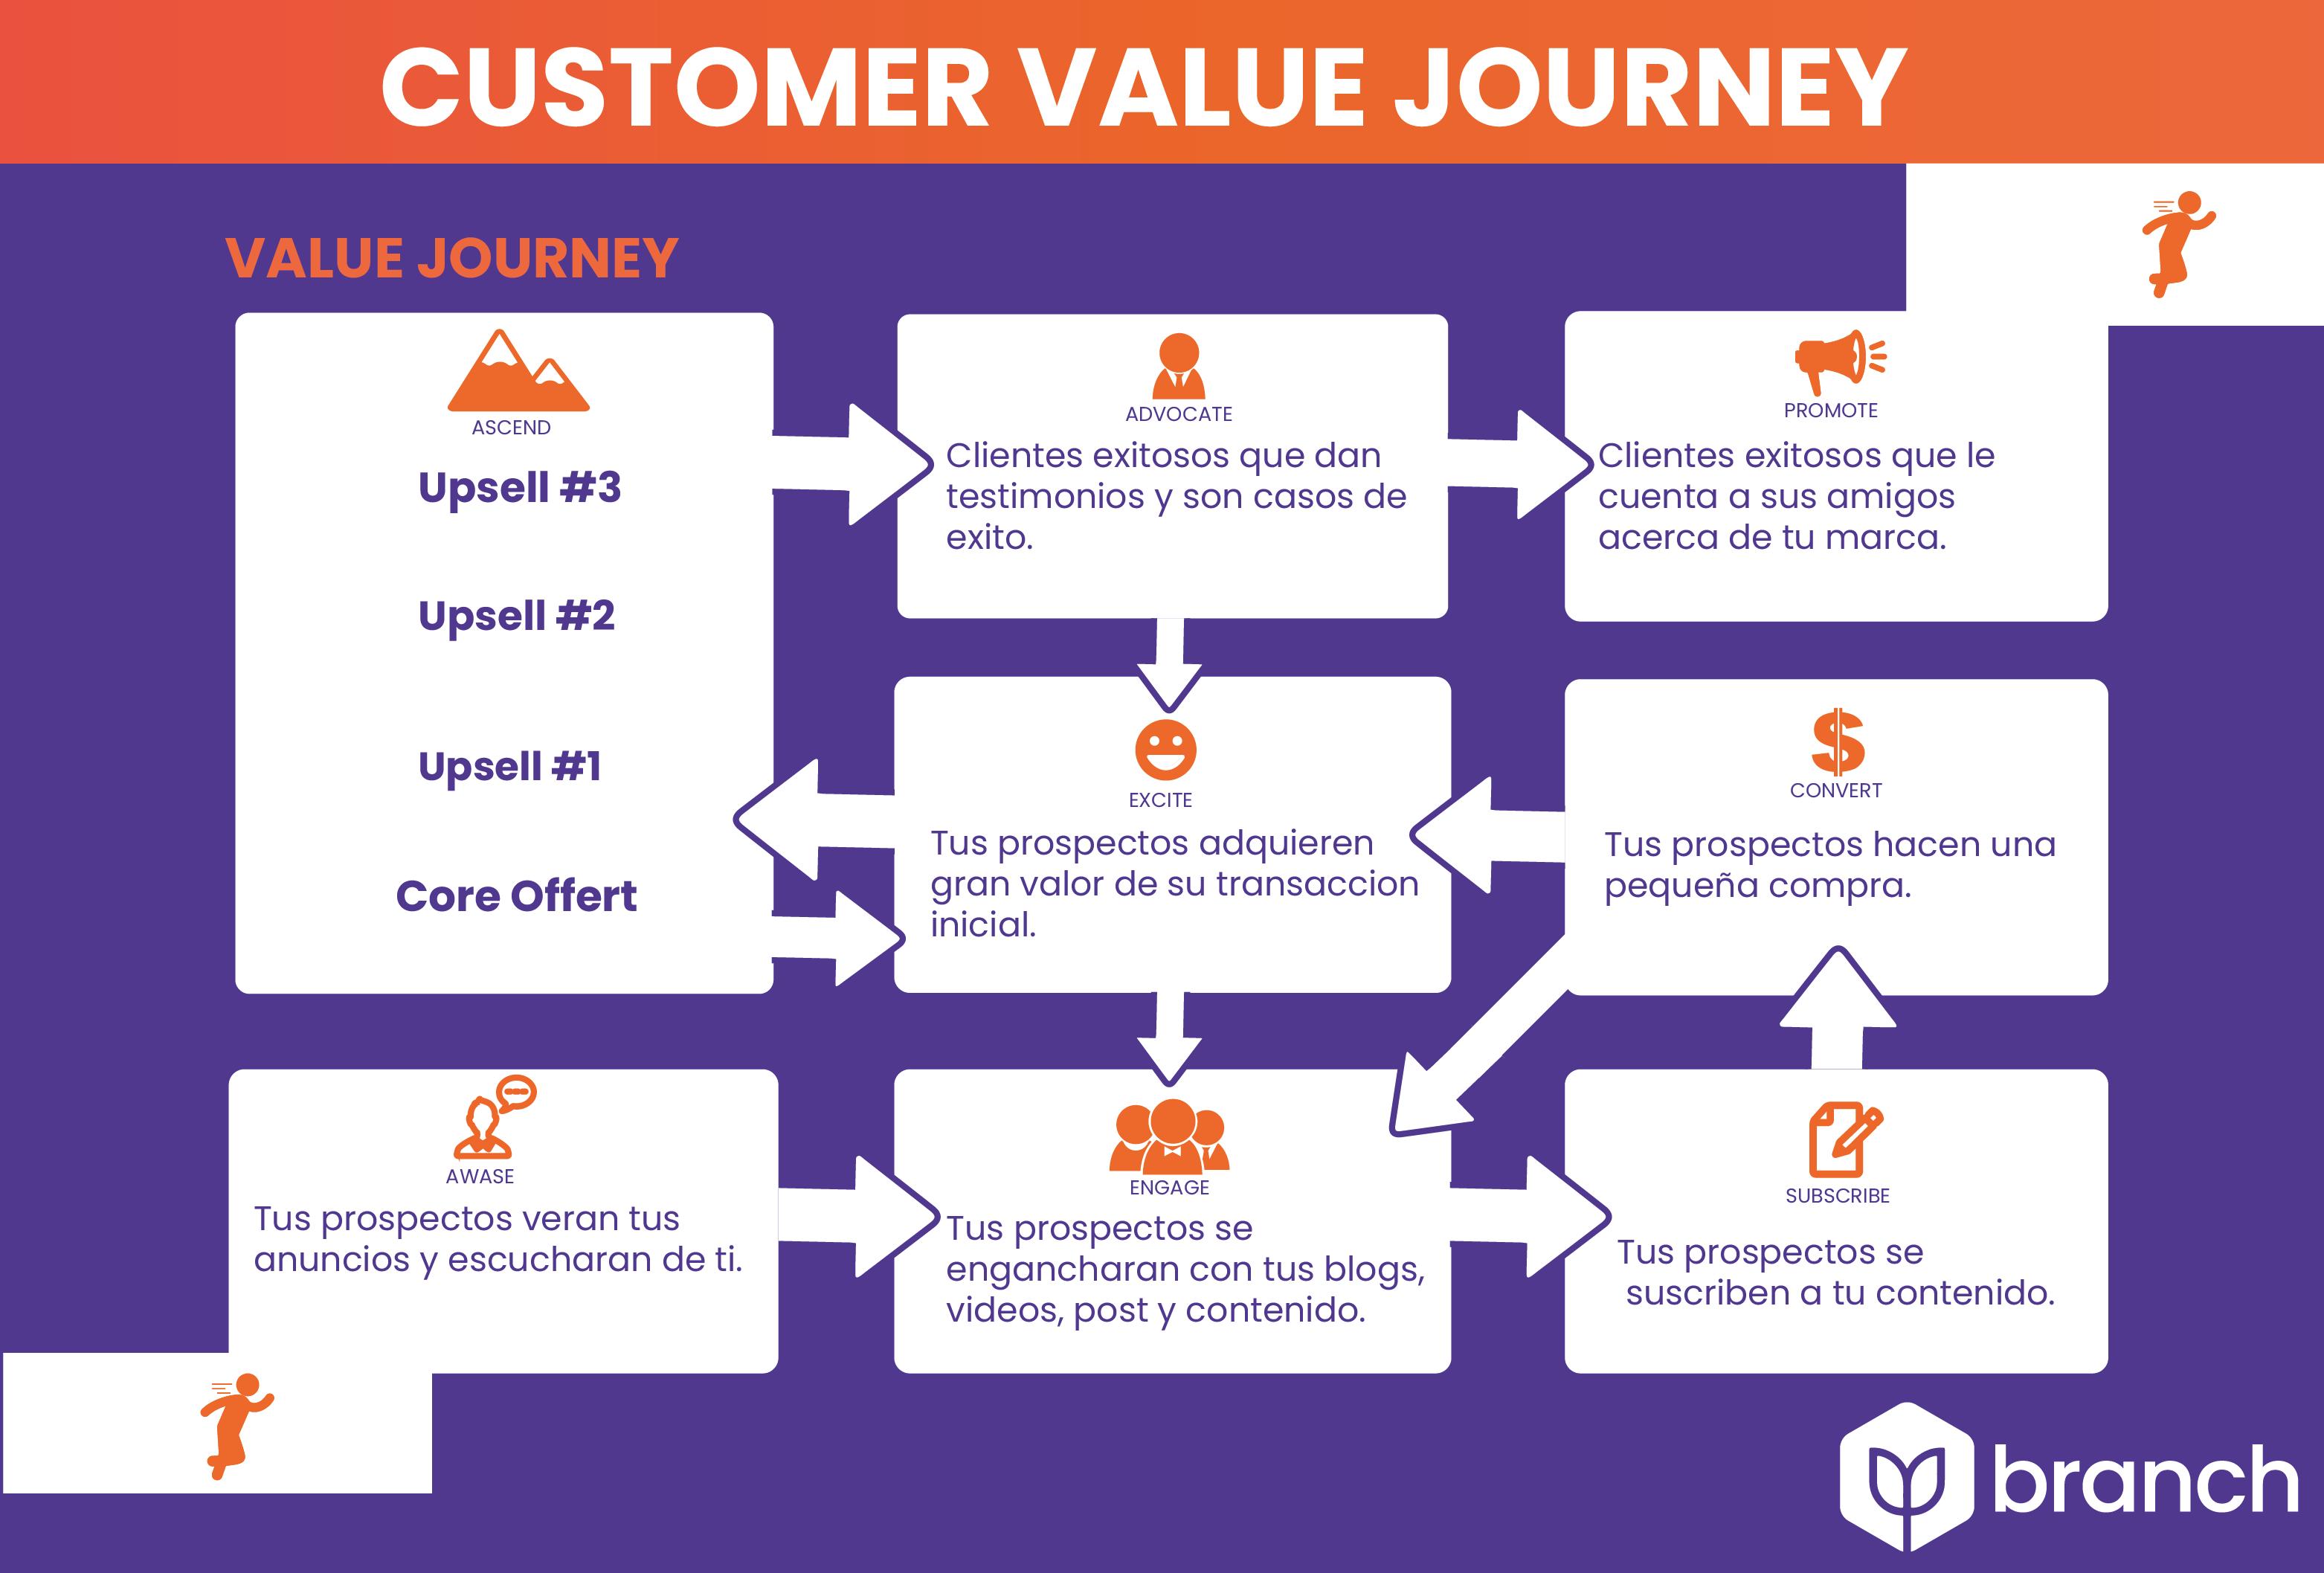 etapas-del-customer-value-journey